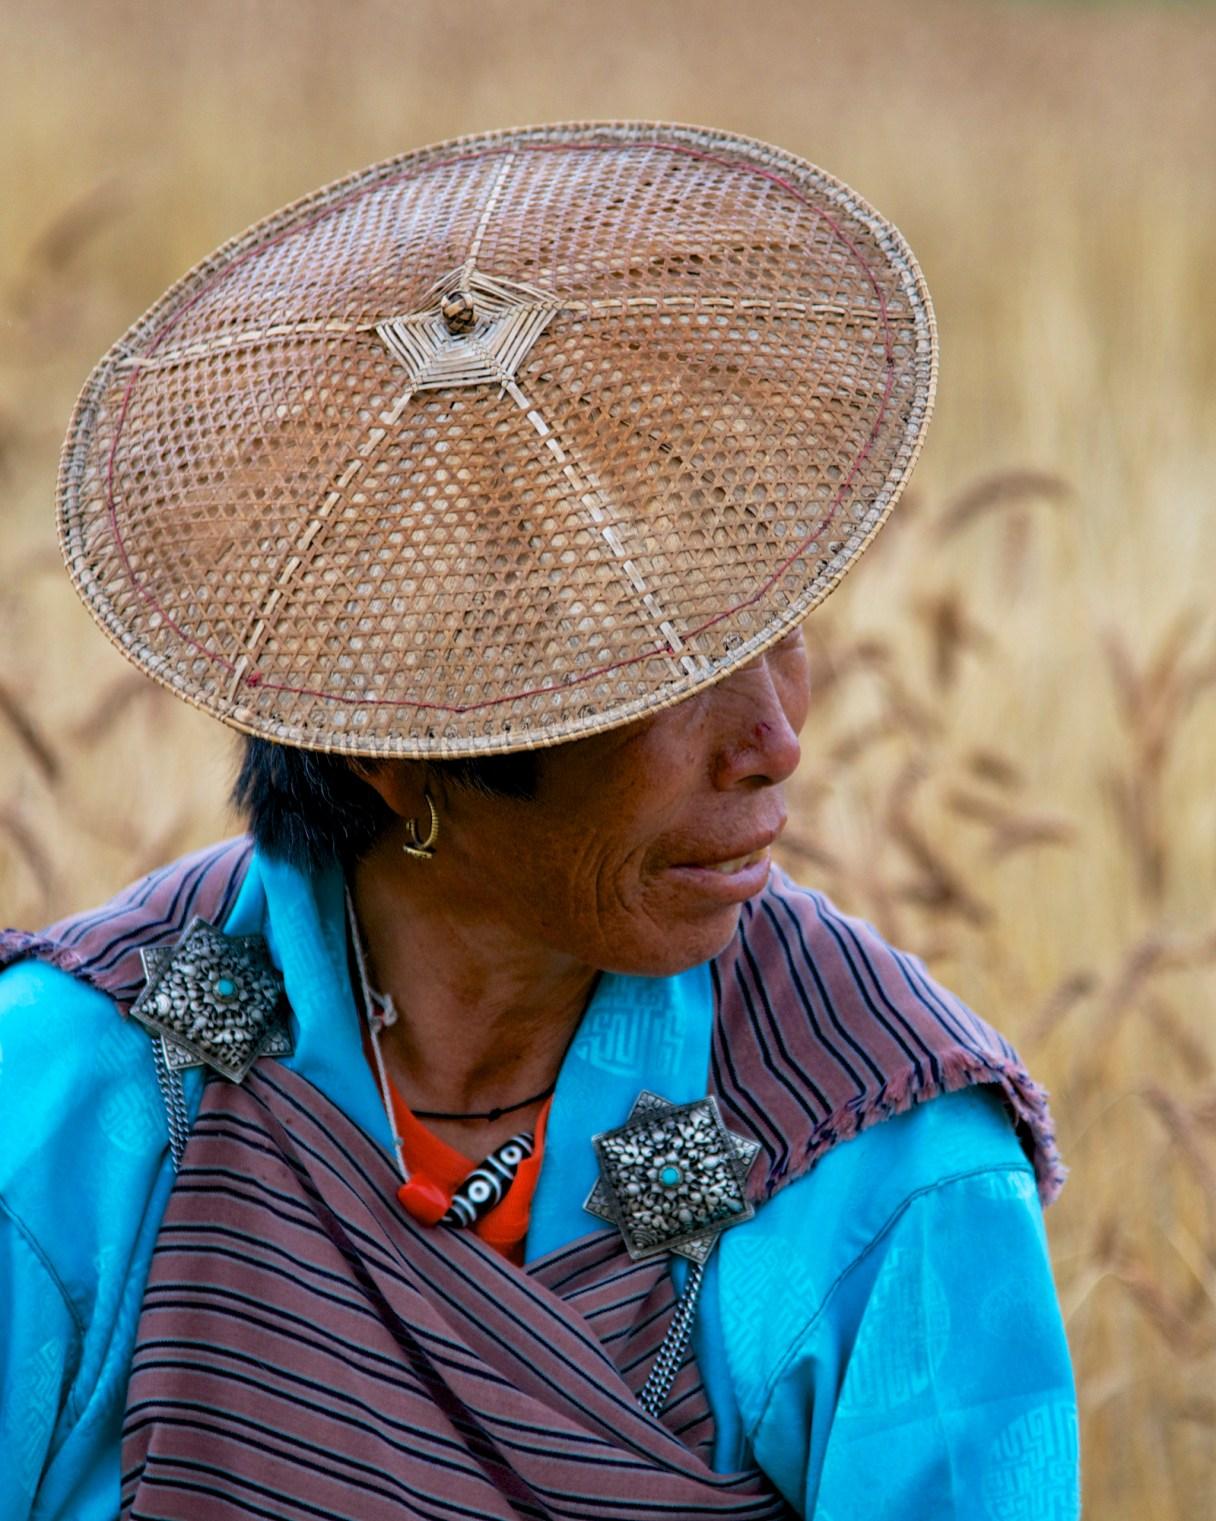 wheat-lady-in-profile-bumthang-bhutan-copyright-2013-ralph-velasco